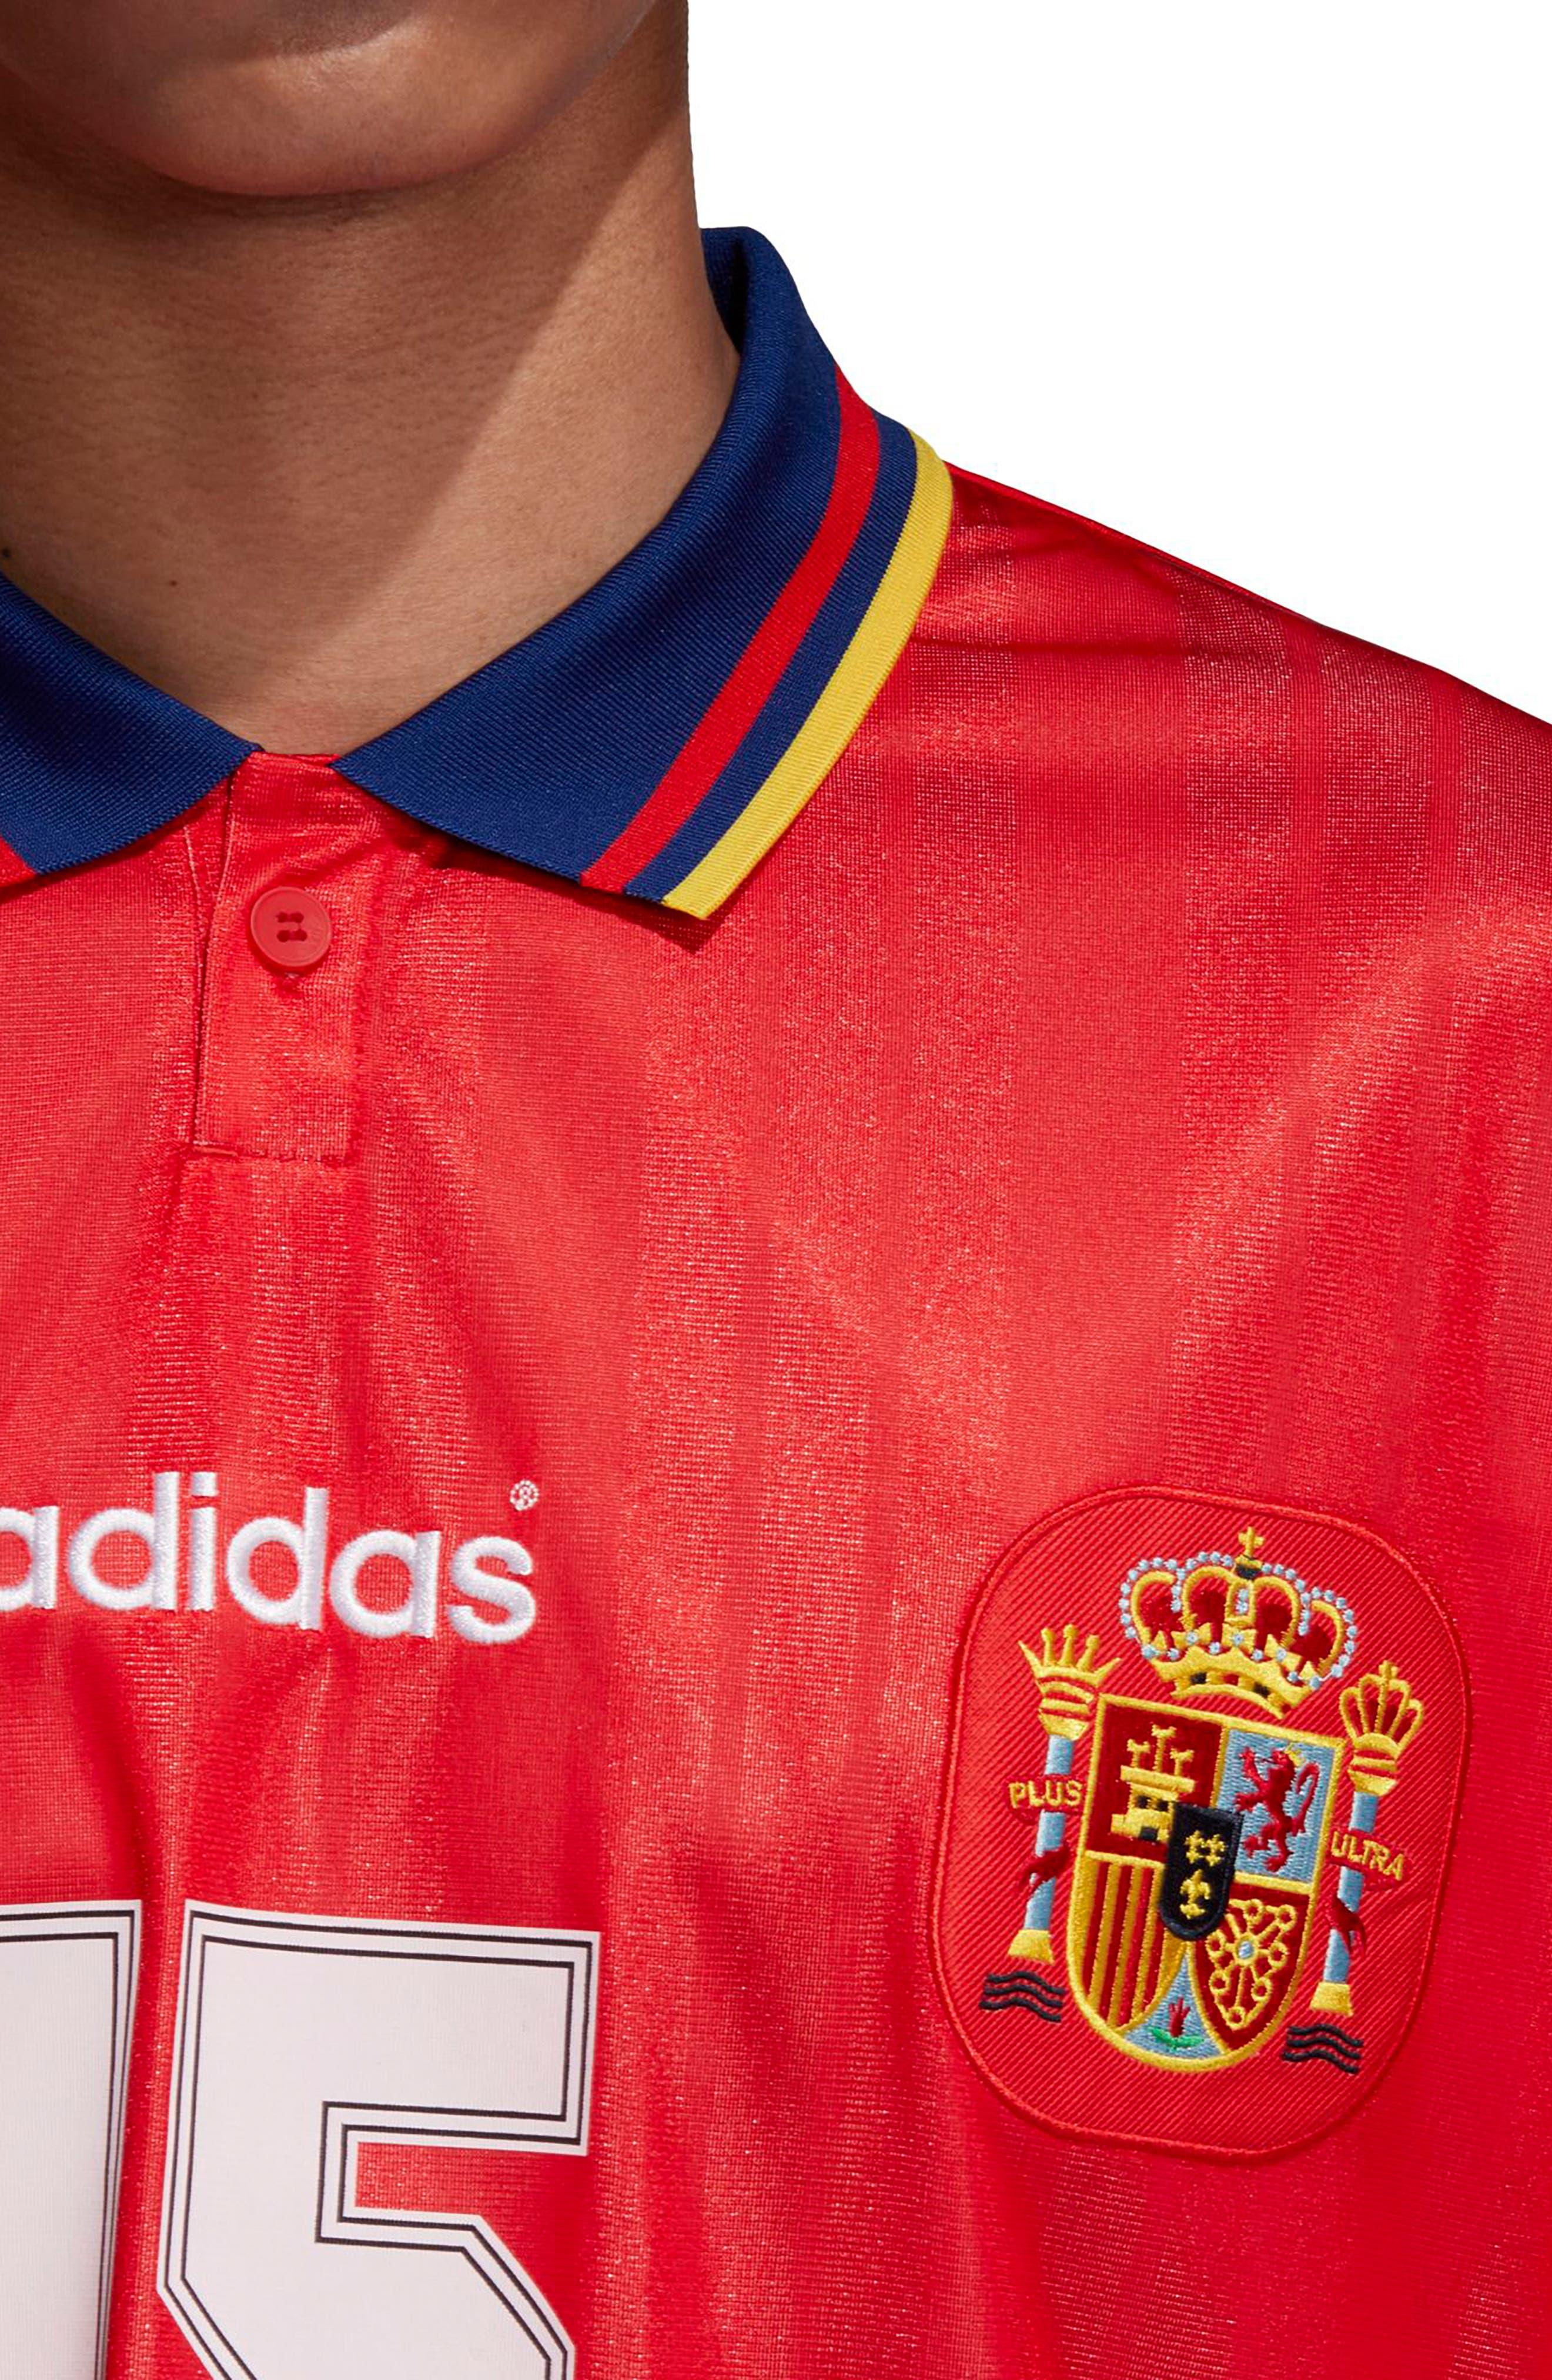 adidas Original Spain 1994 Soccer Jersey,                             Alternate thumbnail 5, color,                             625